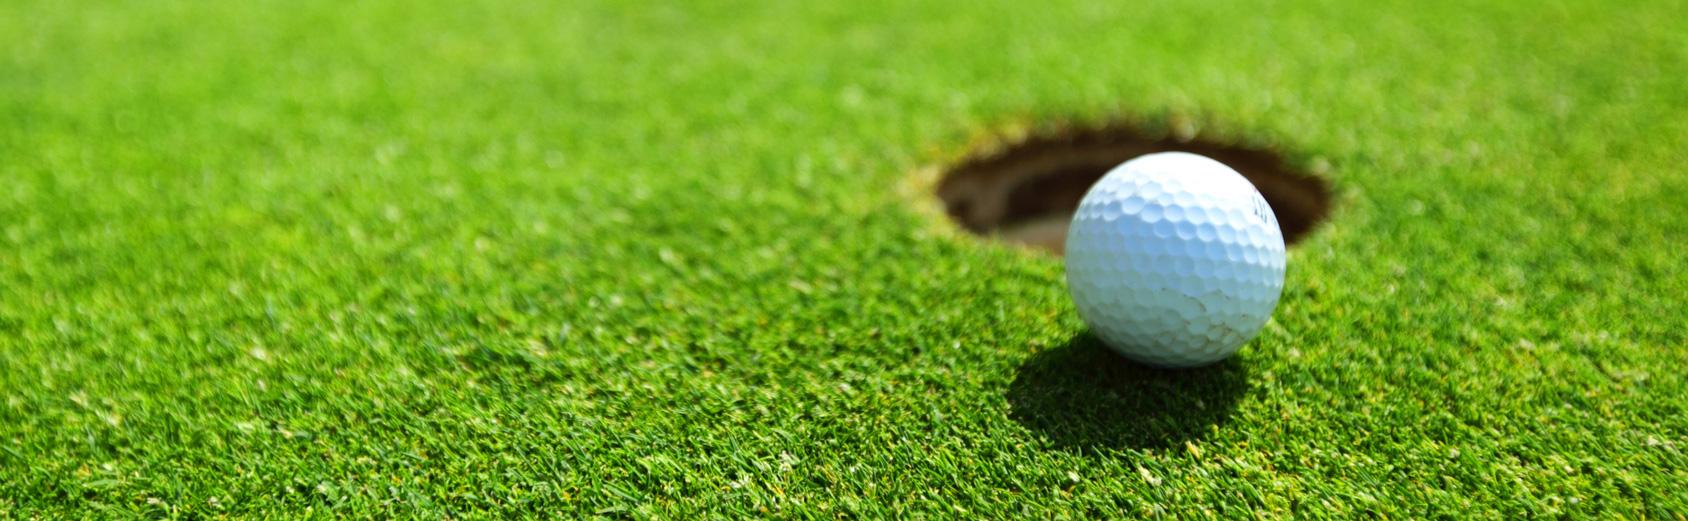 Golfkurse – logicalgolf academies